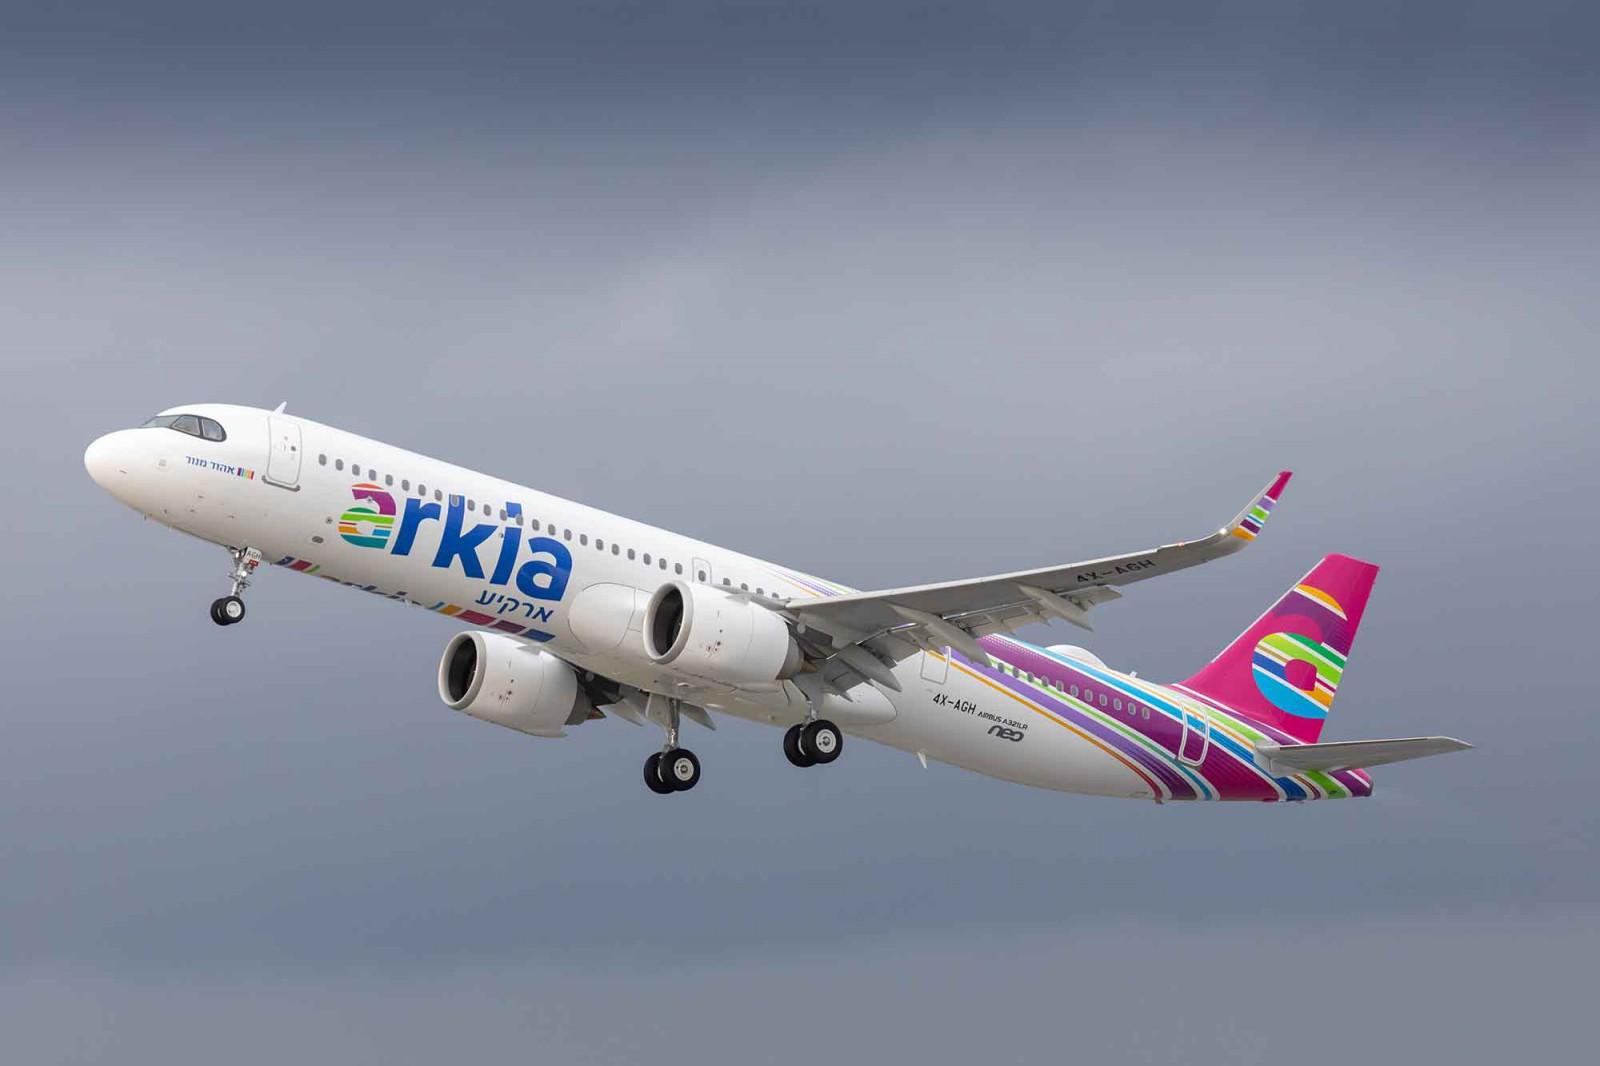 Airkia A321LR launch customer